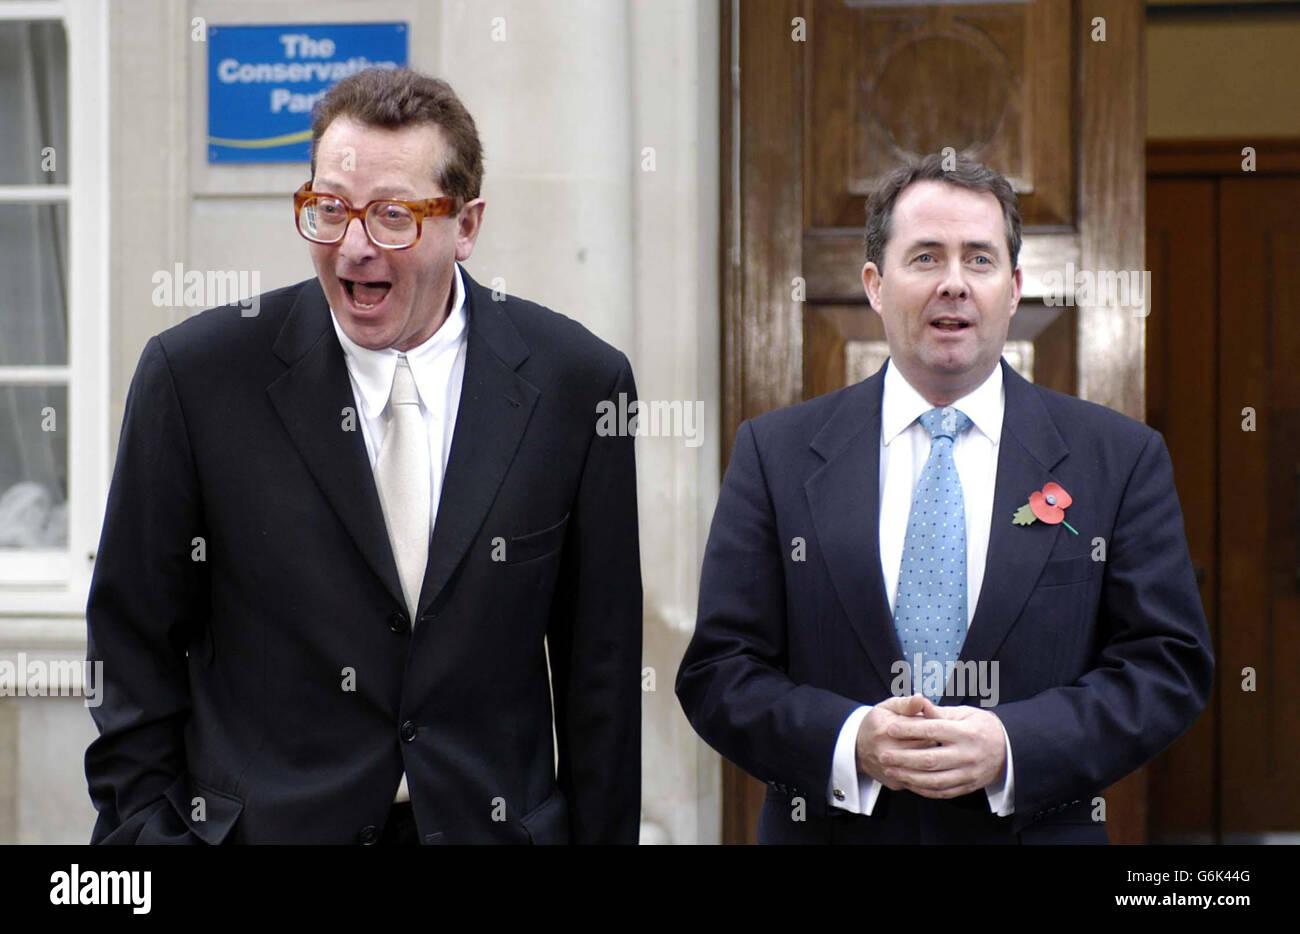 POLITICS Tory Cabinet